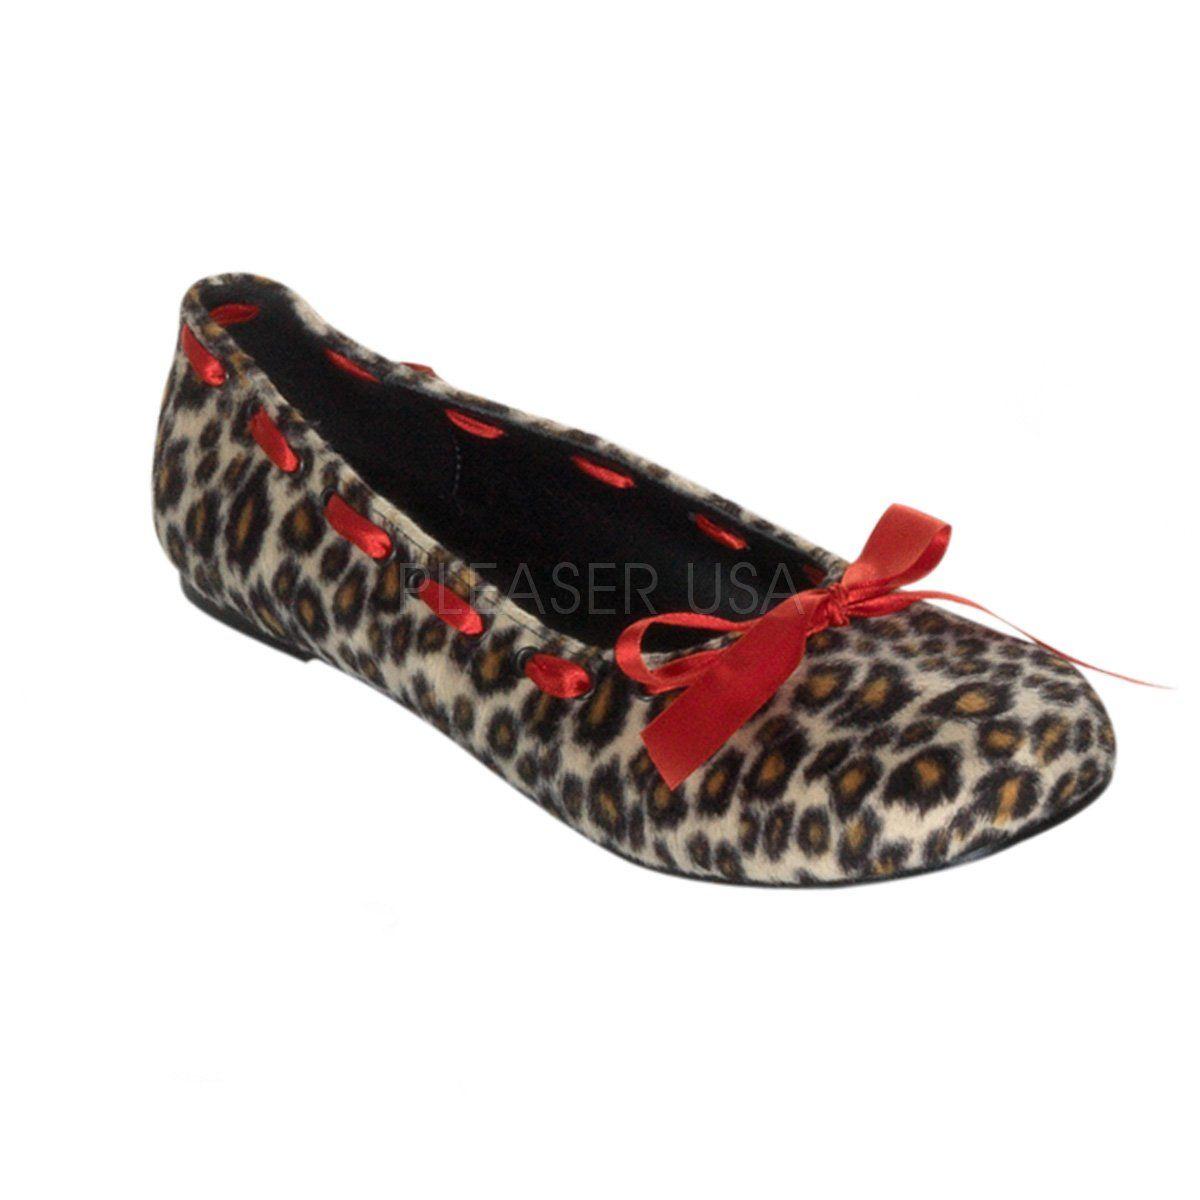 980175908b7f MICHAEL Michael Kors Women's Ella Flat Chocolate Printed Snake/Embossed  Crocco Flat 7 M - Flats for women (*Amazon Partner-Link) | Flats for Women  | Flats, ...